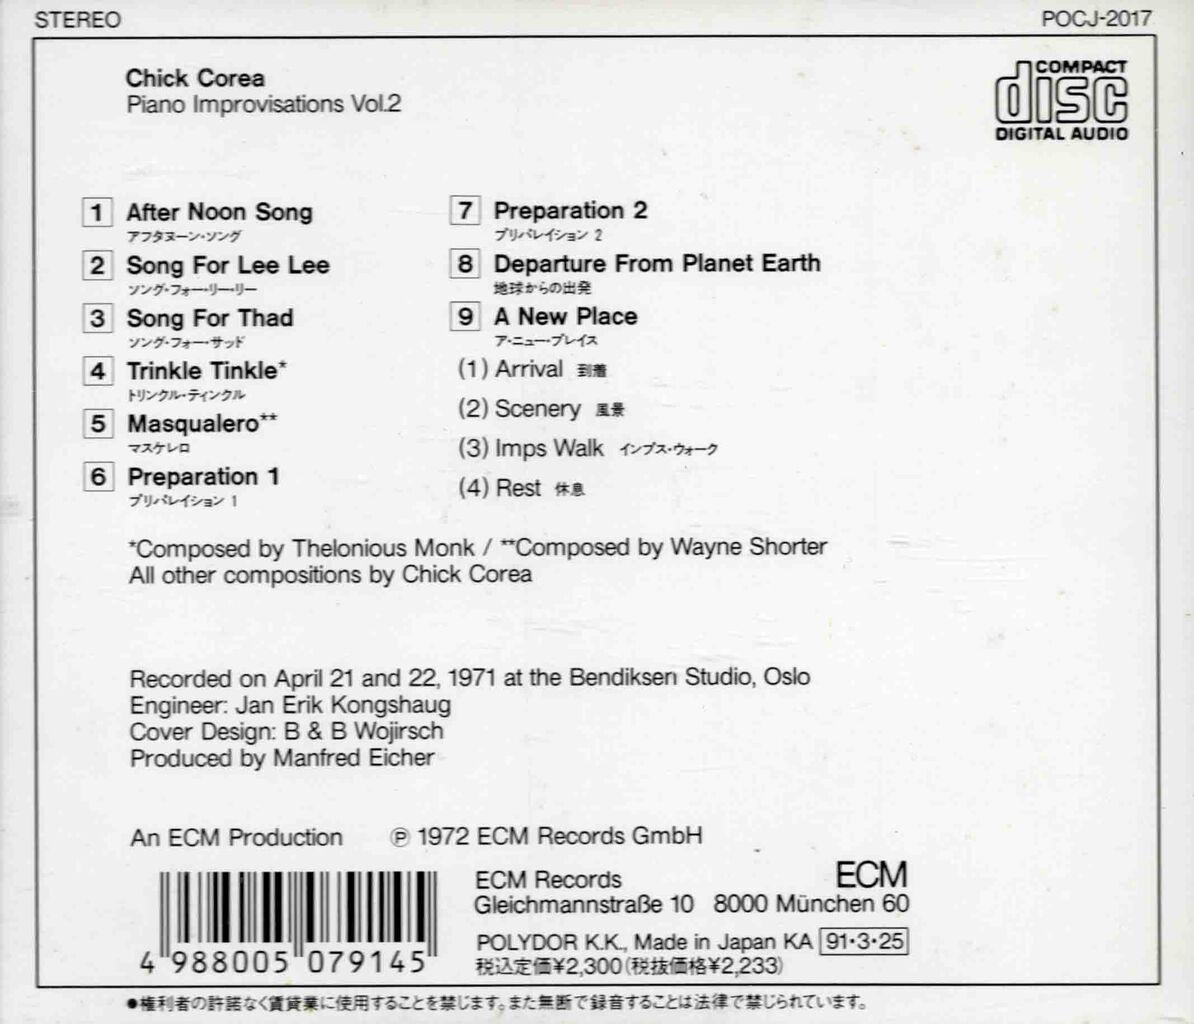 PIANO IMPROVISATIONS VOL.2-2